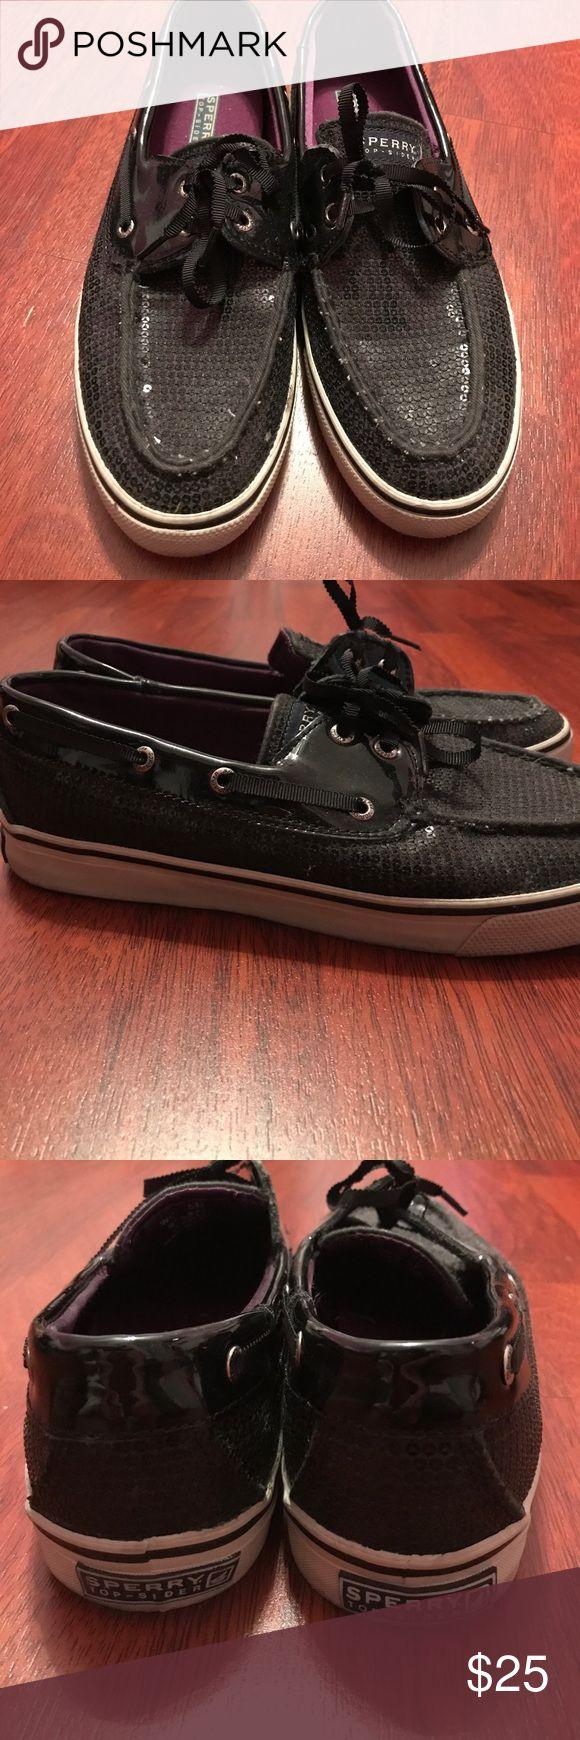 BLACK SPERRY SNEAKERS👟 Black Sperry Top Spider Sneakers *Great Condition!!* Sperry Top-Sider Shoes Sneakers